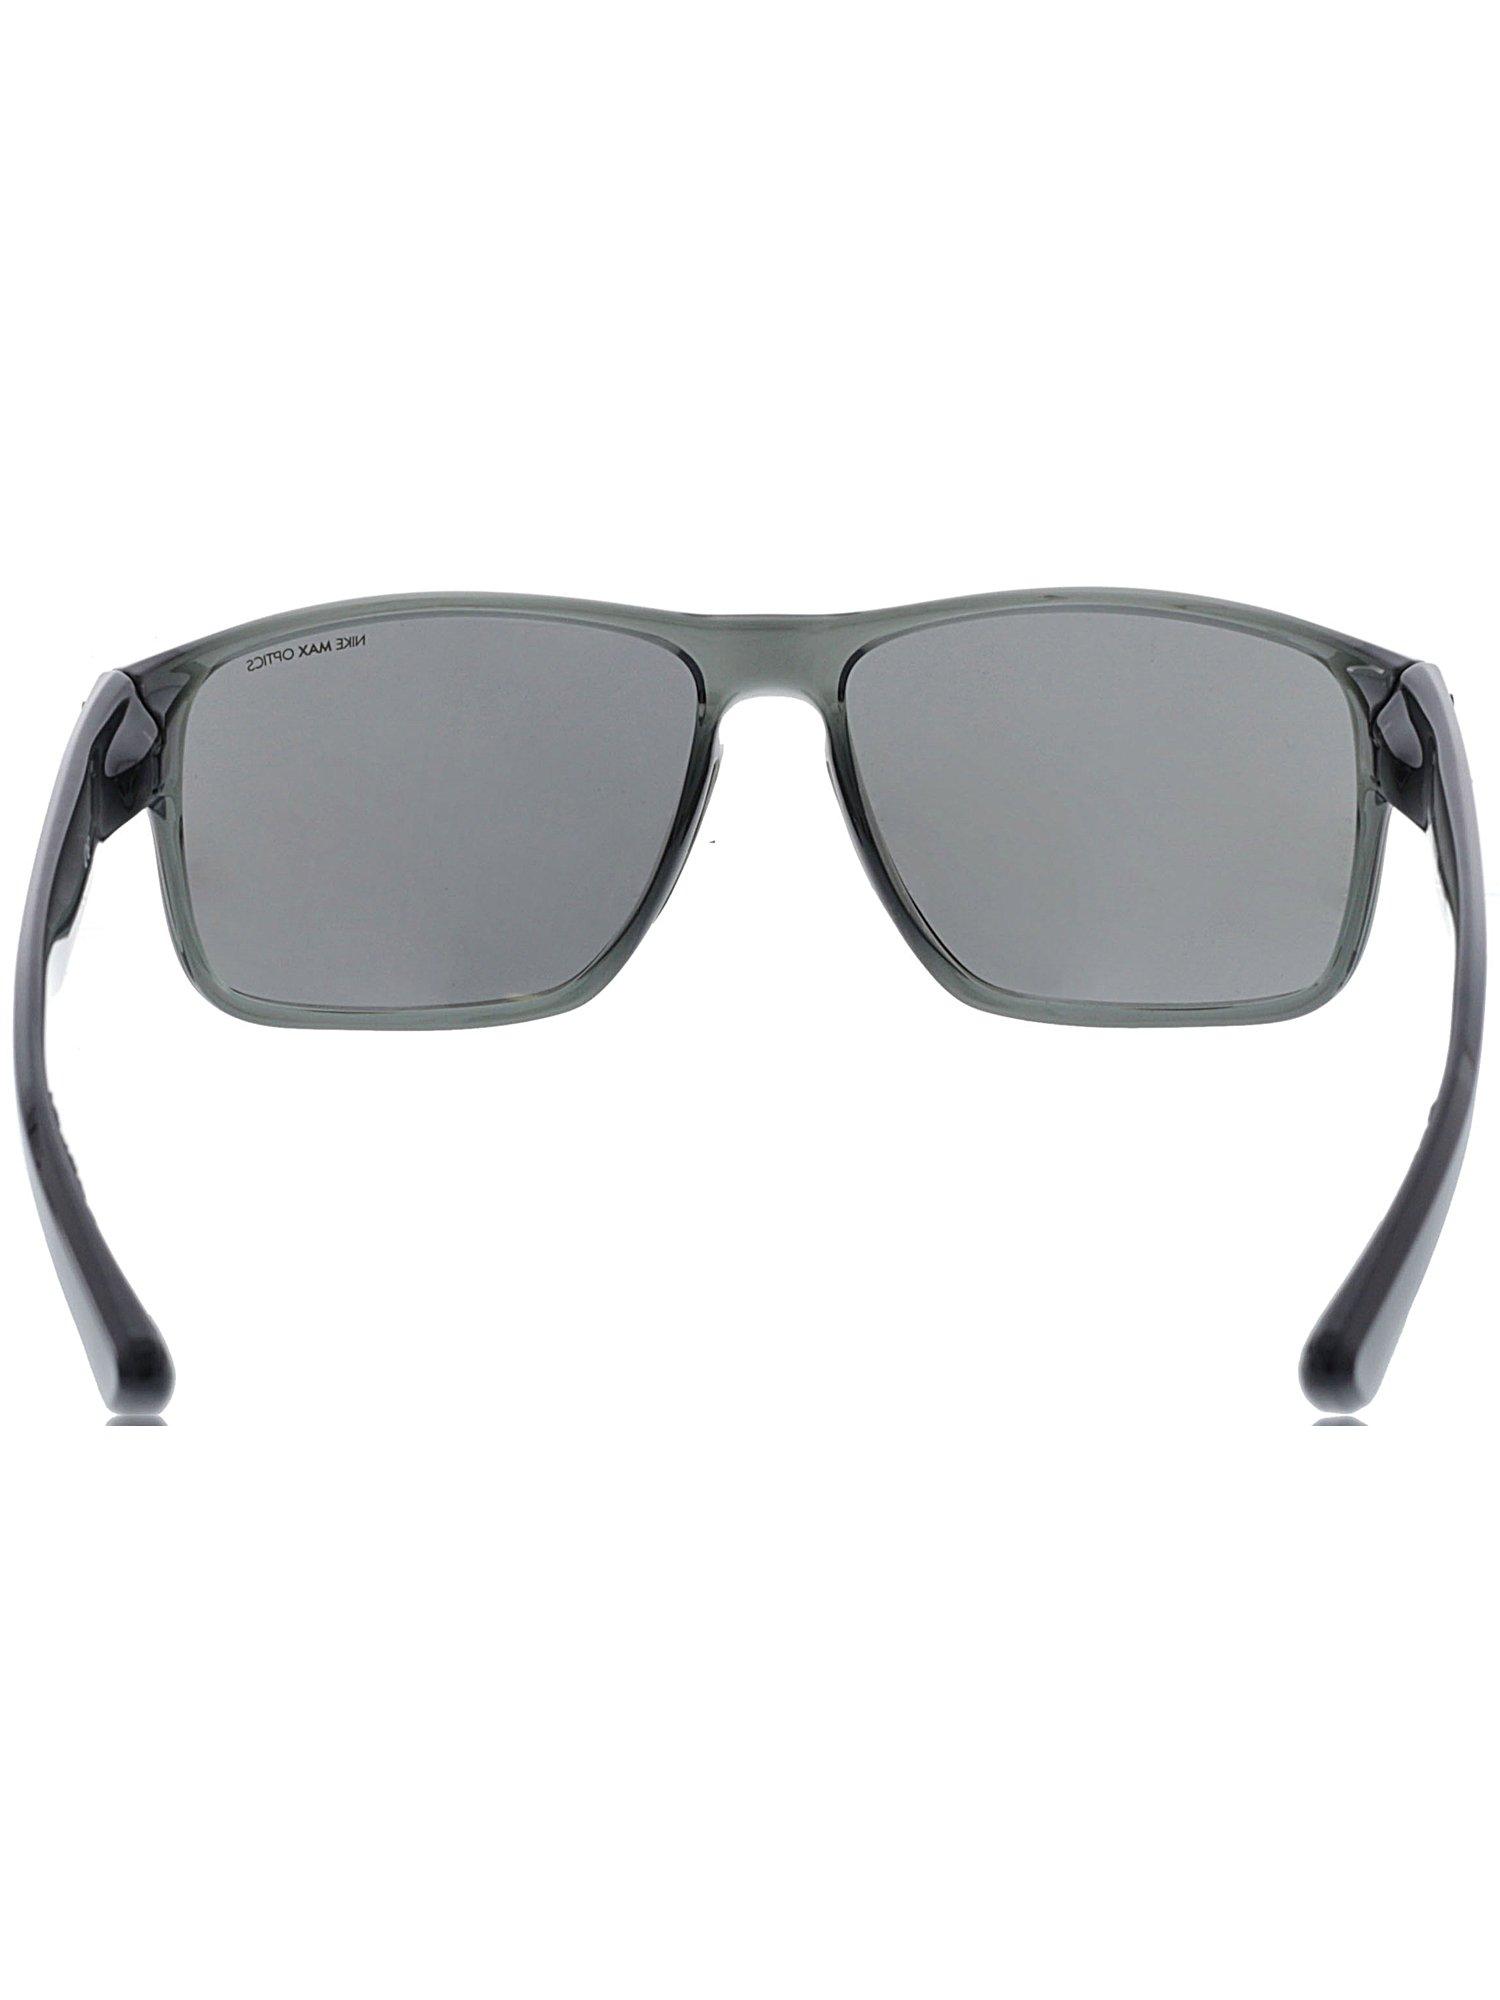 bc1790dd094cb AreaTrend  Nike Men s Mirrored Mavrk Grey Rectangle Sunglasses ...